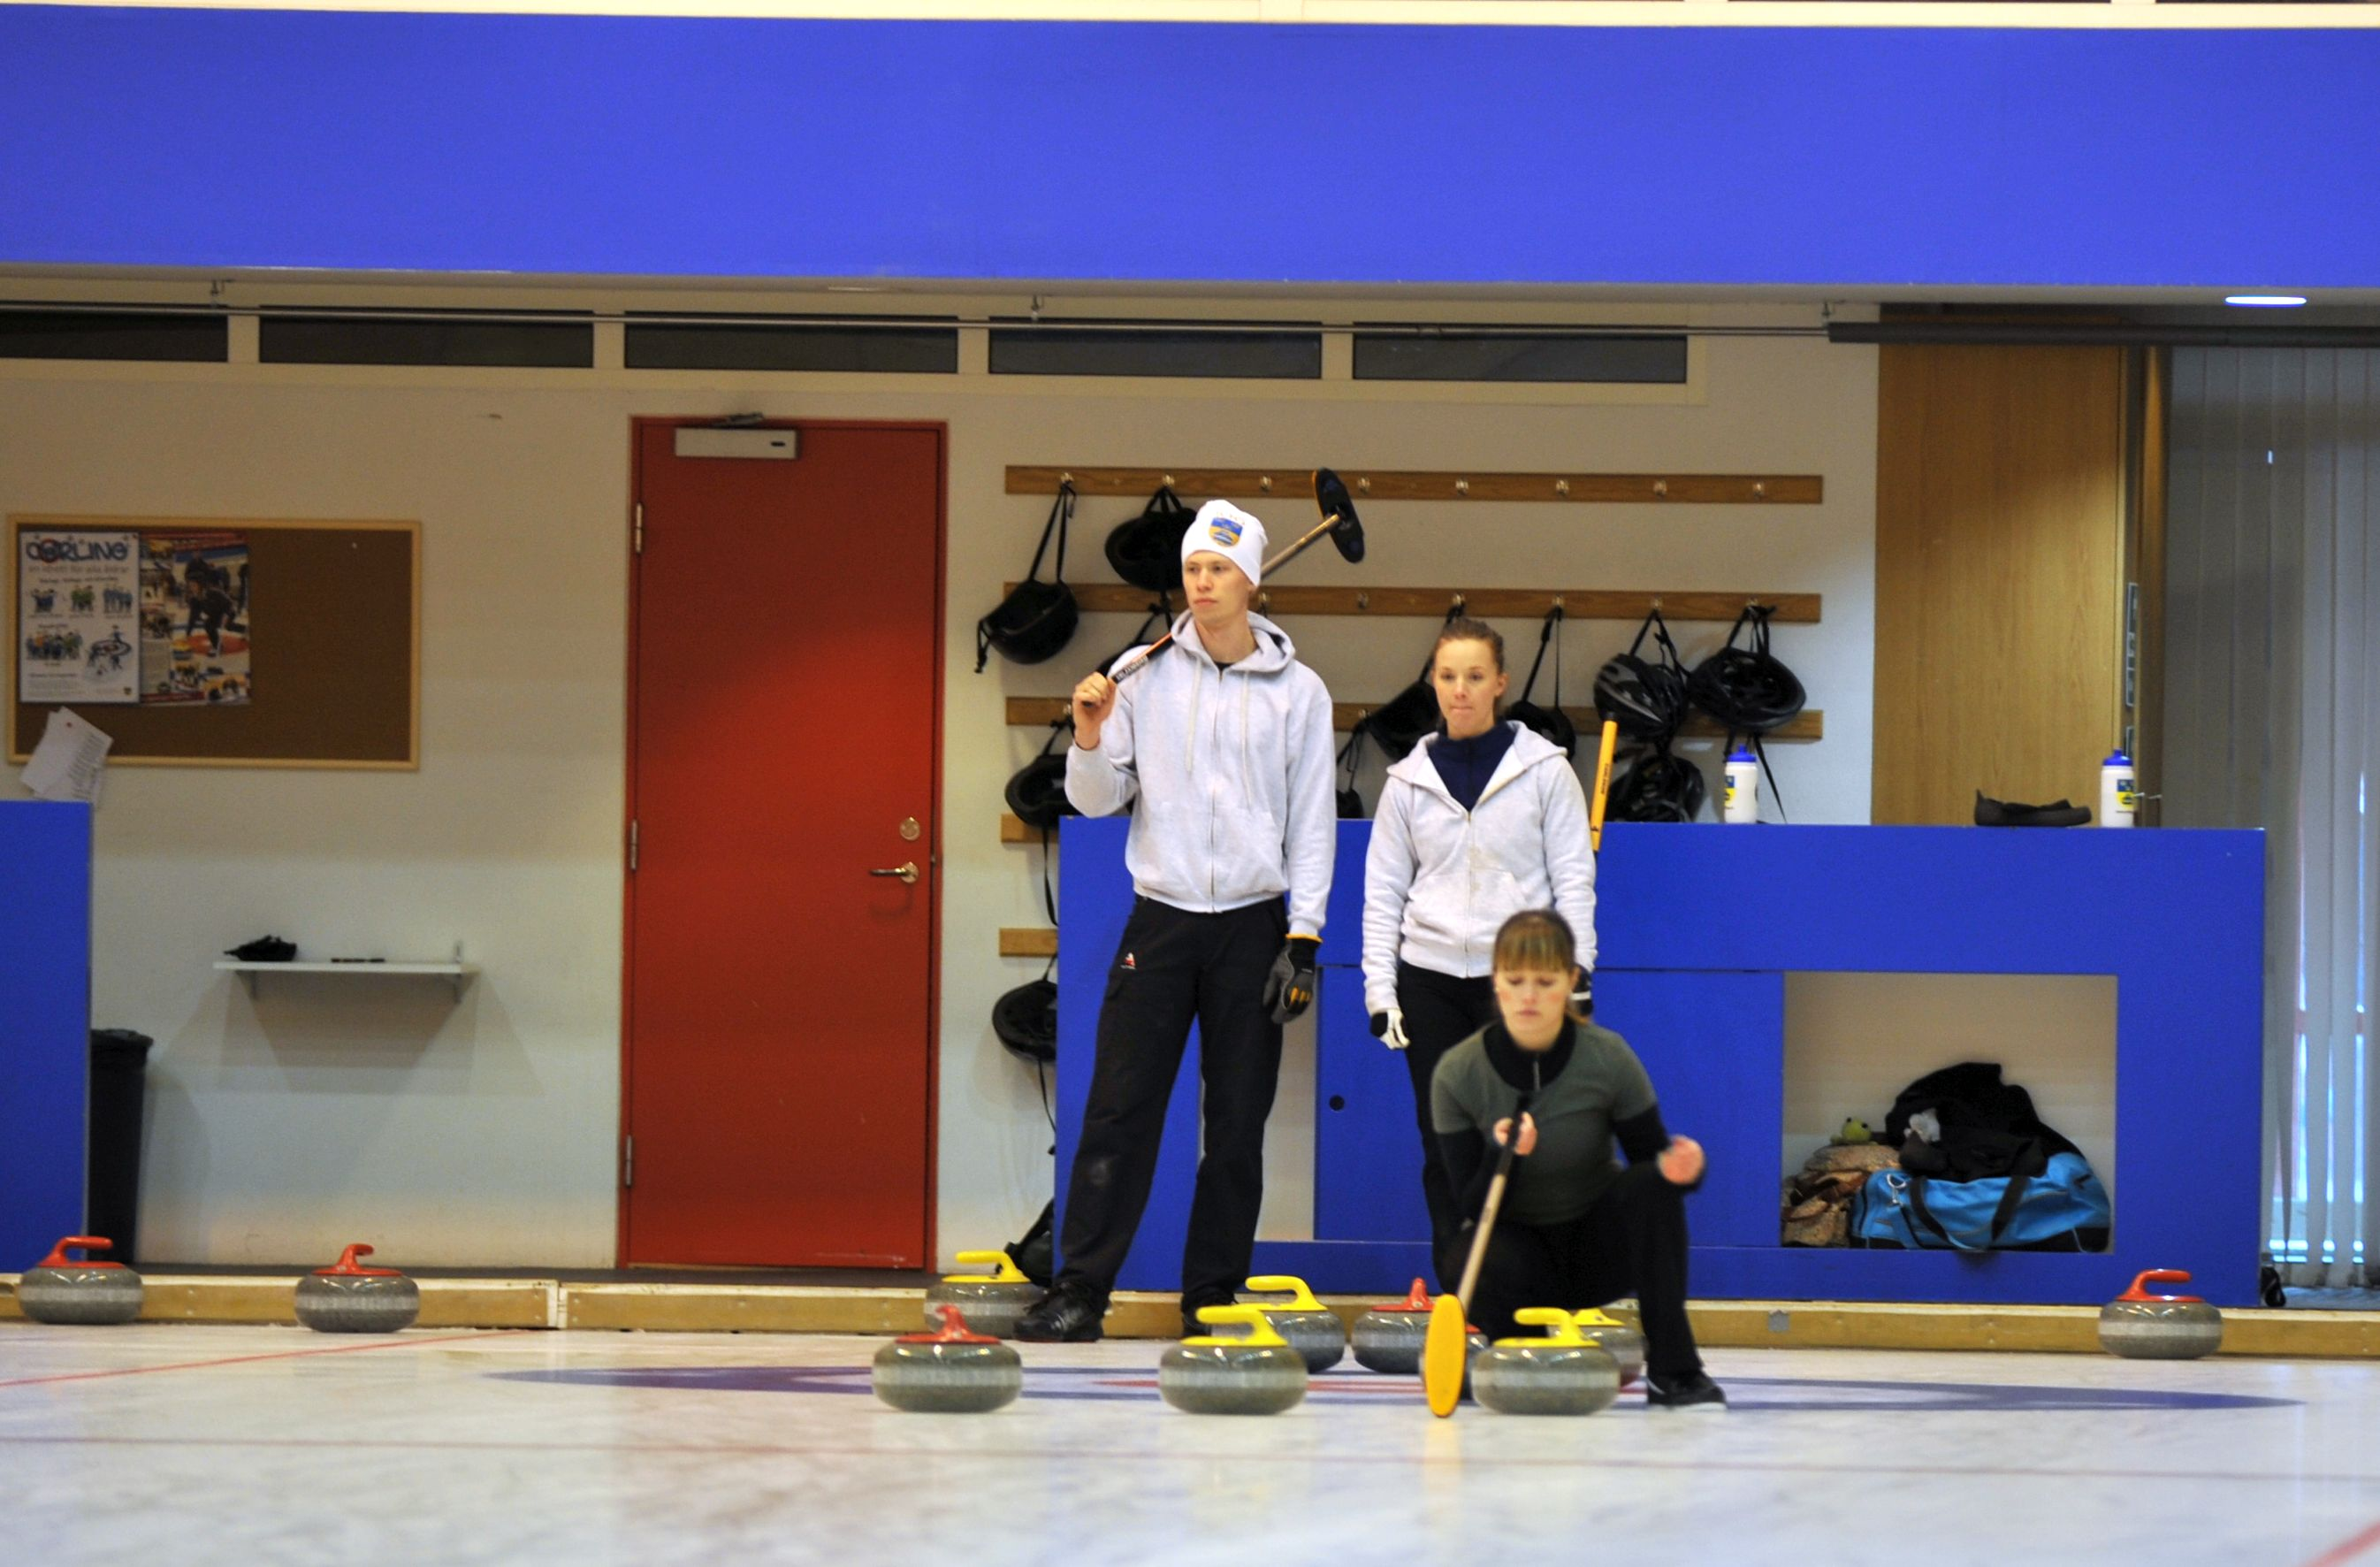 Sjoberg klar for bronsmatch